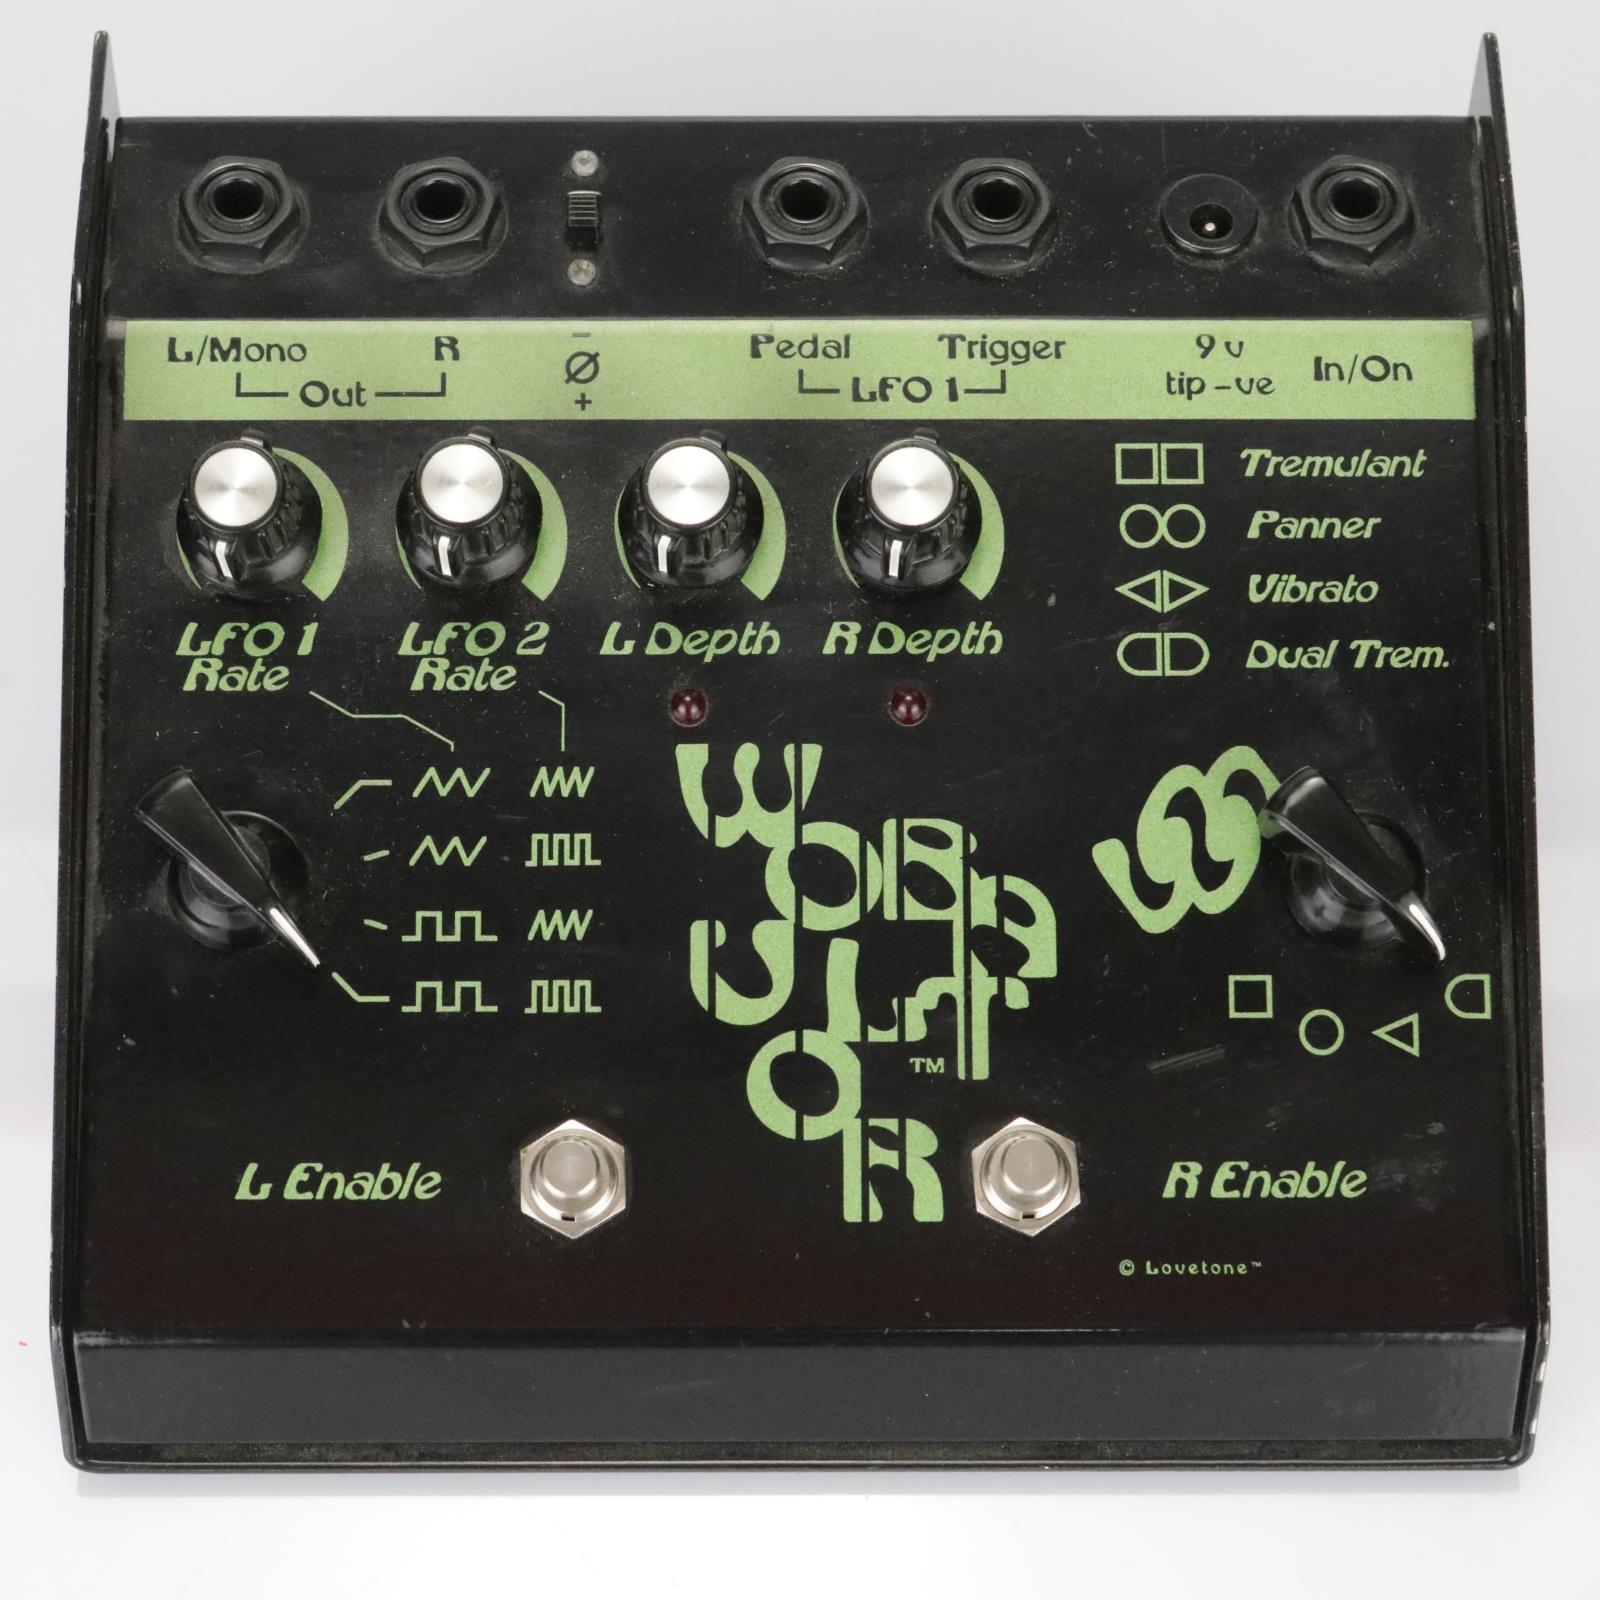 Lovetone Wobulator Dual Tremolo Vibrato Effects Pedal Stompbox #39337